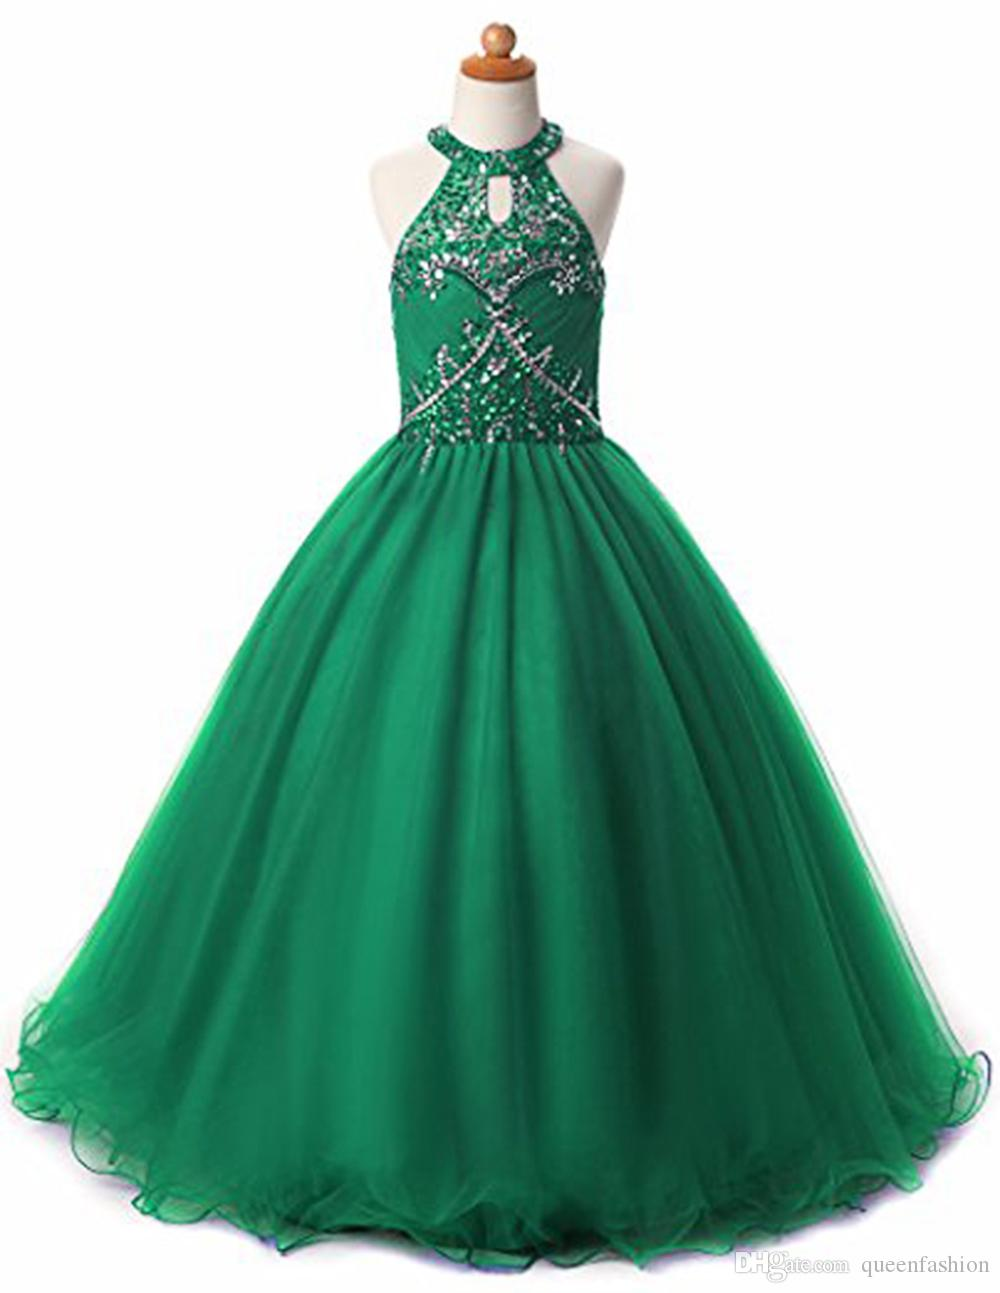 Glitz Girls Pageant Dresses Keyhole Back Crystal Beadings Halter Kids Ball Gown Prom Dress Pageant Dresses for Girls Flower Girl Dresses